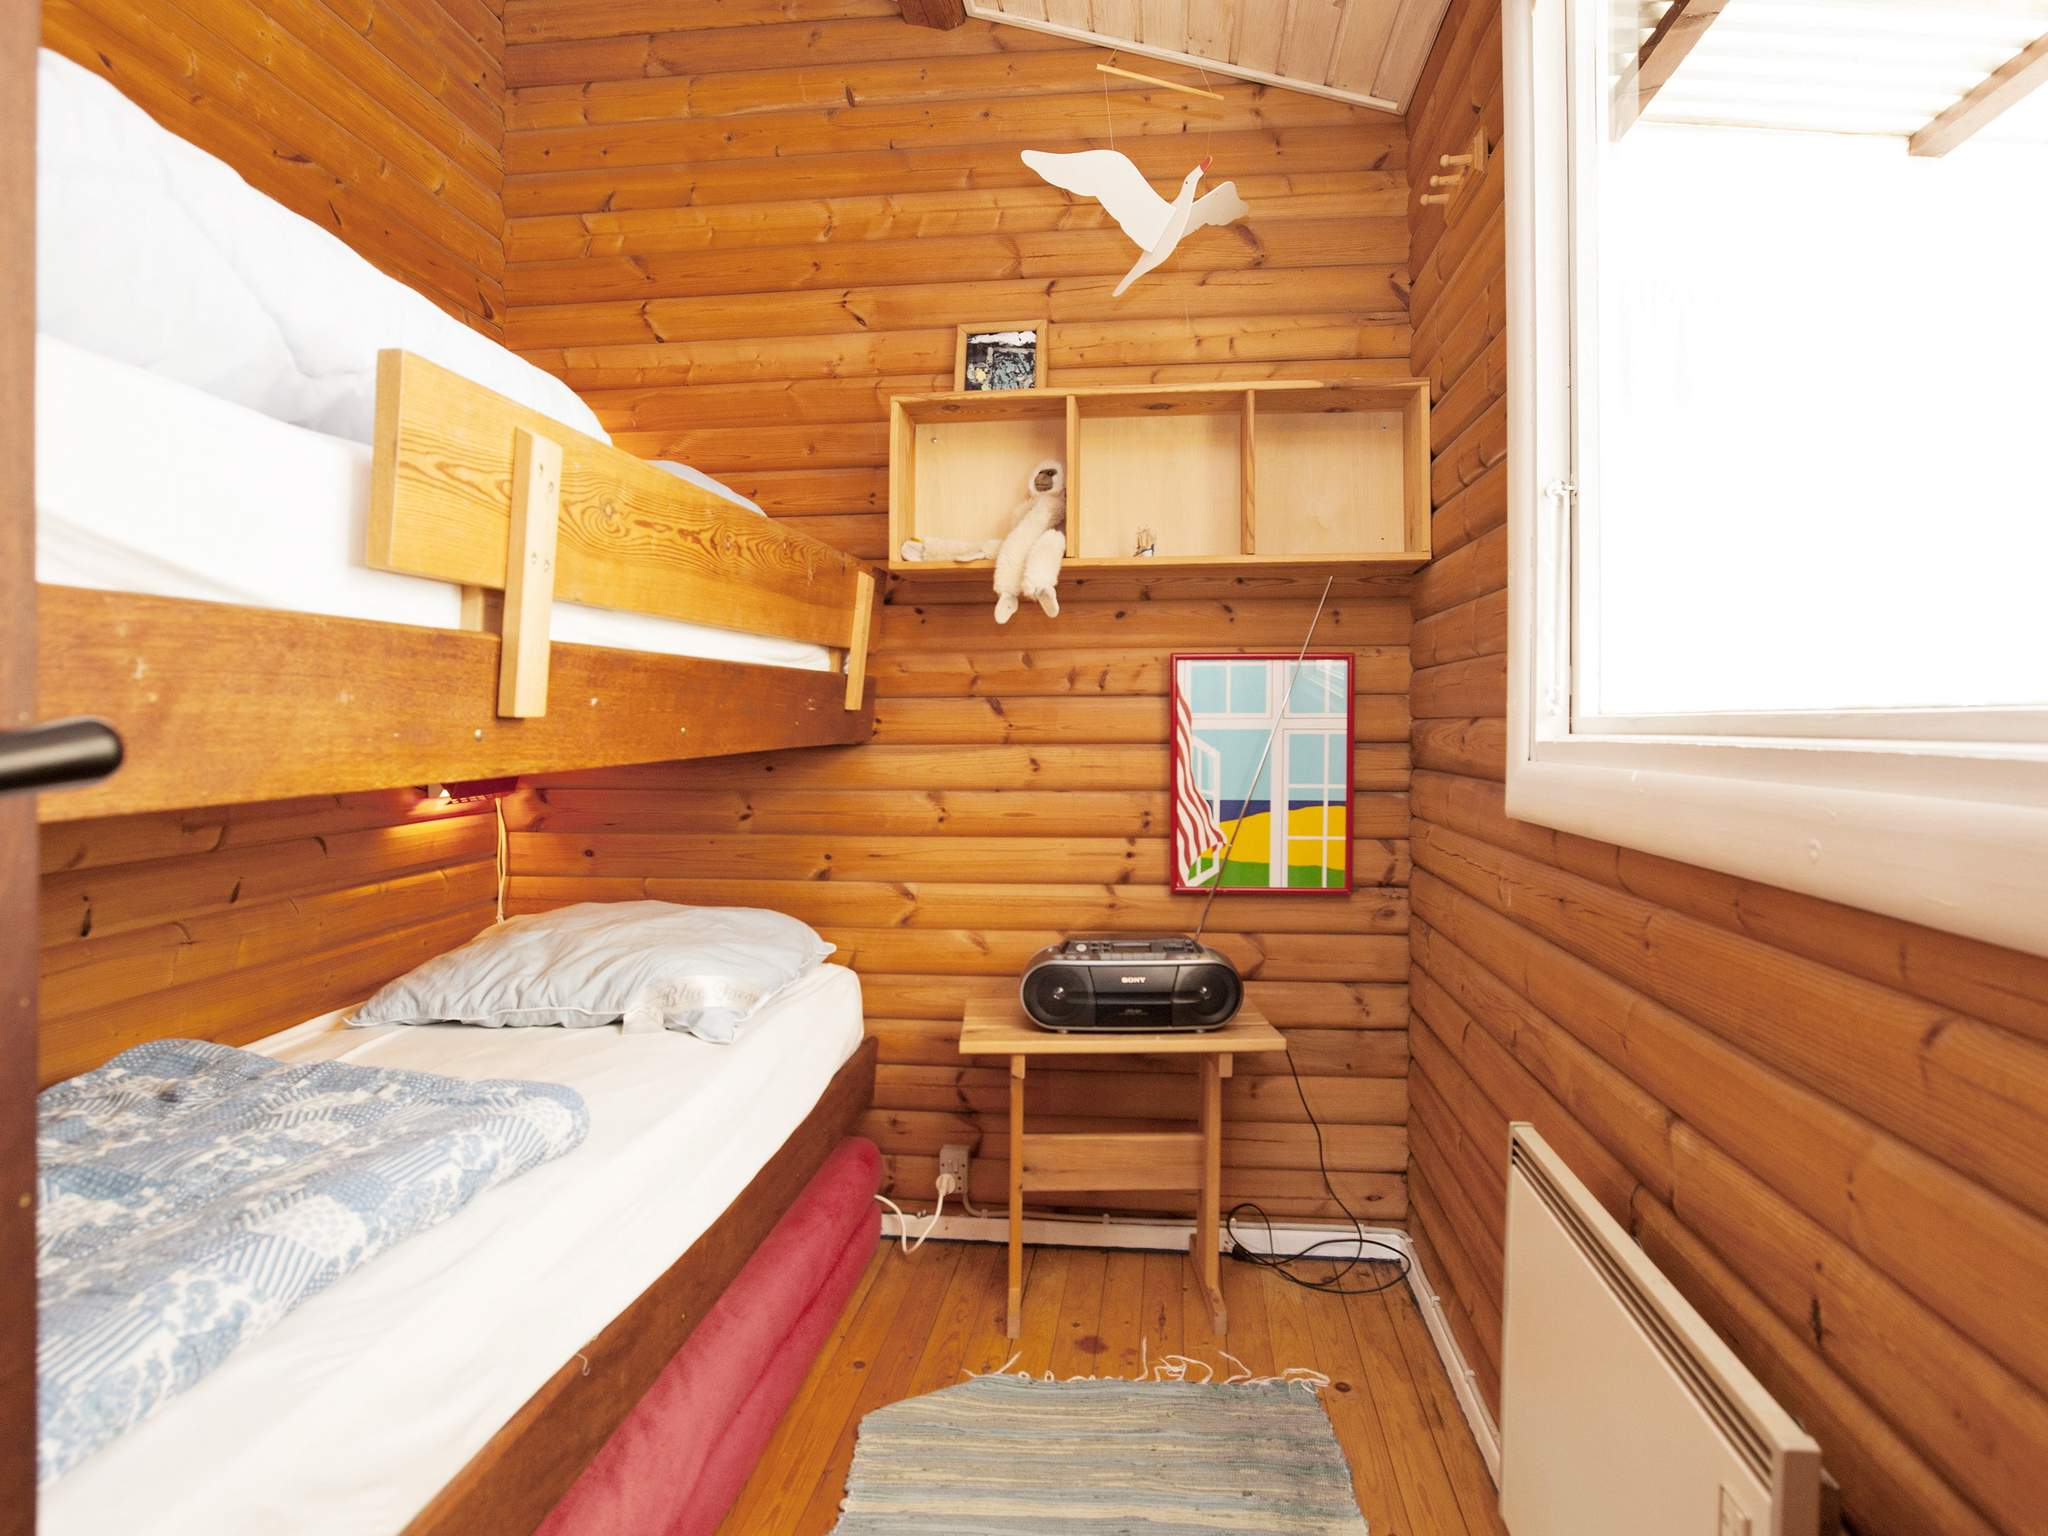 Maison de vacances Kramnitze (87262), Kramnitse, , Lolland, Danemark, image 16